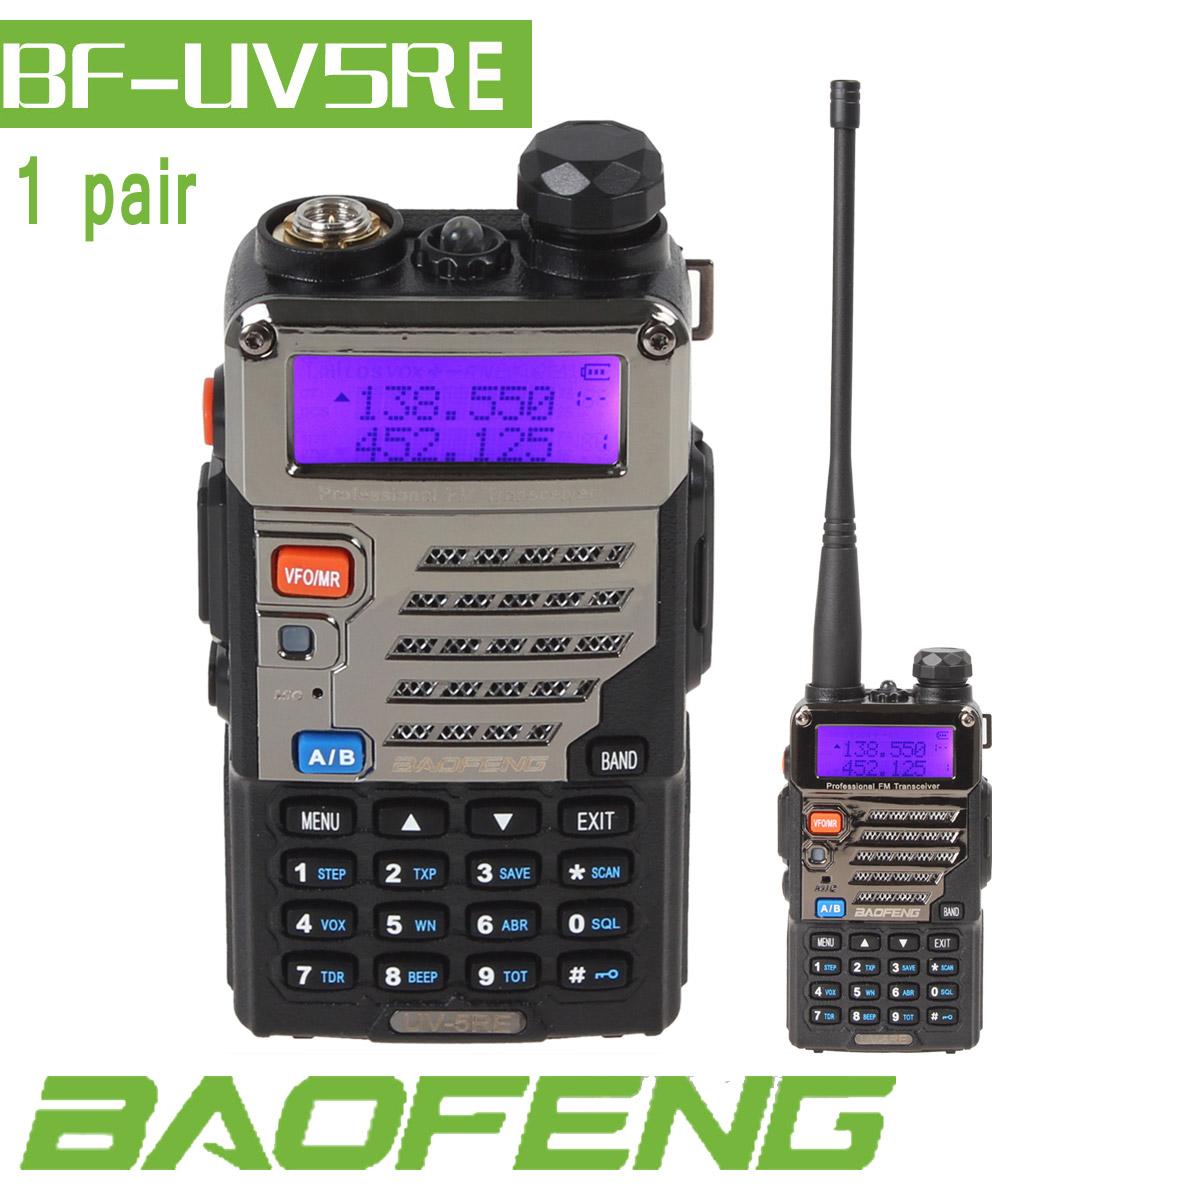 Portable radio Baofeng UV-5RE Dual Band UHF/VHF 36-174MHz/400-480Mhz Two Way Radio Walkie Talkie Handheld Transceiver 2pcs/lot(China (Mainland))